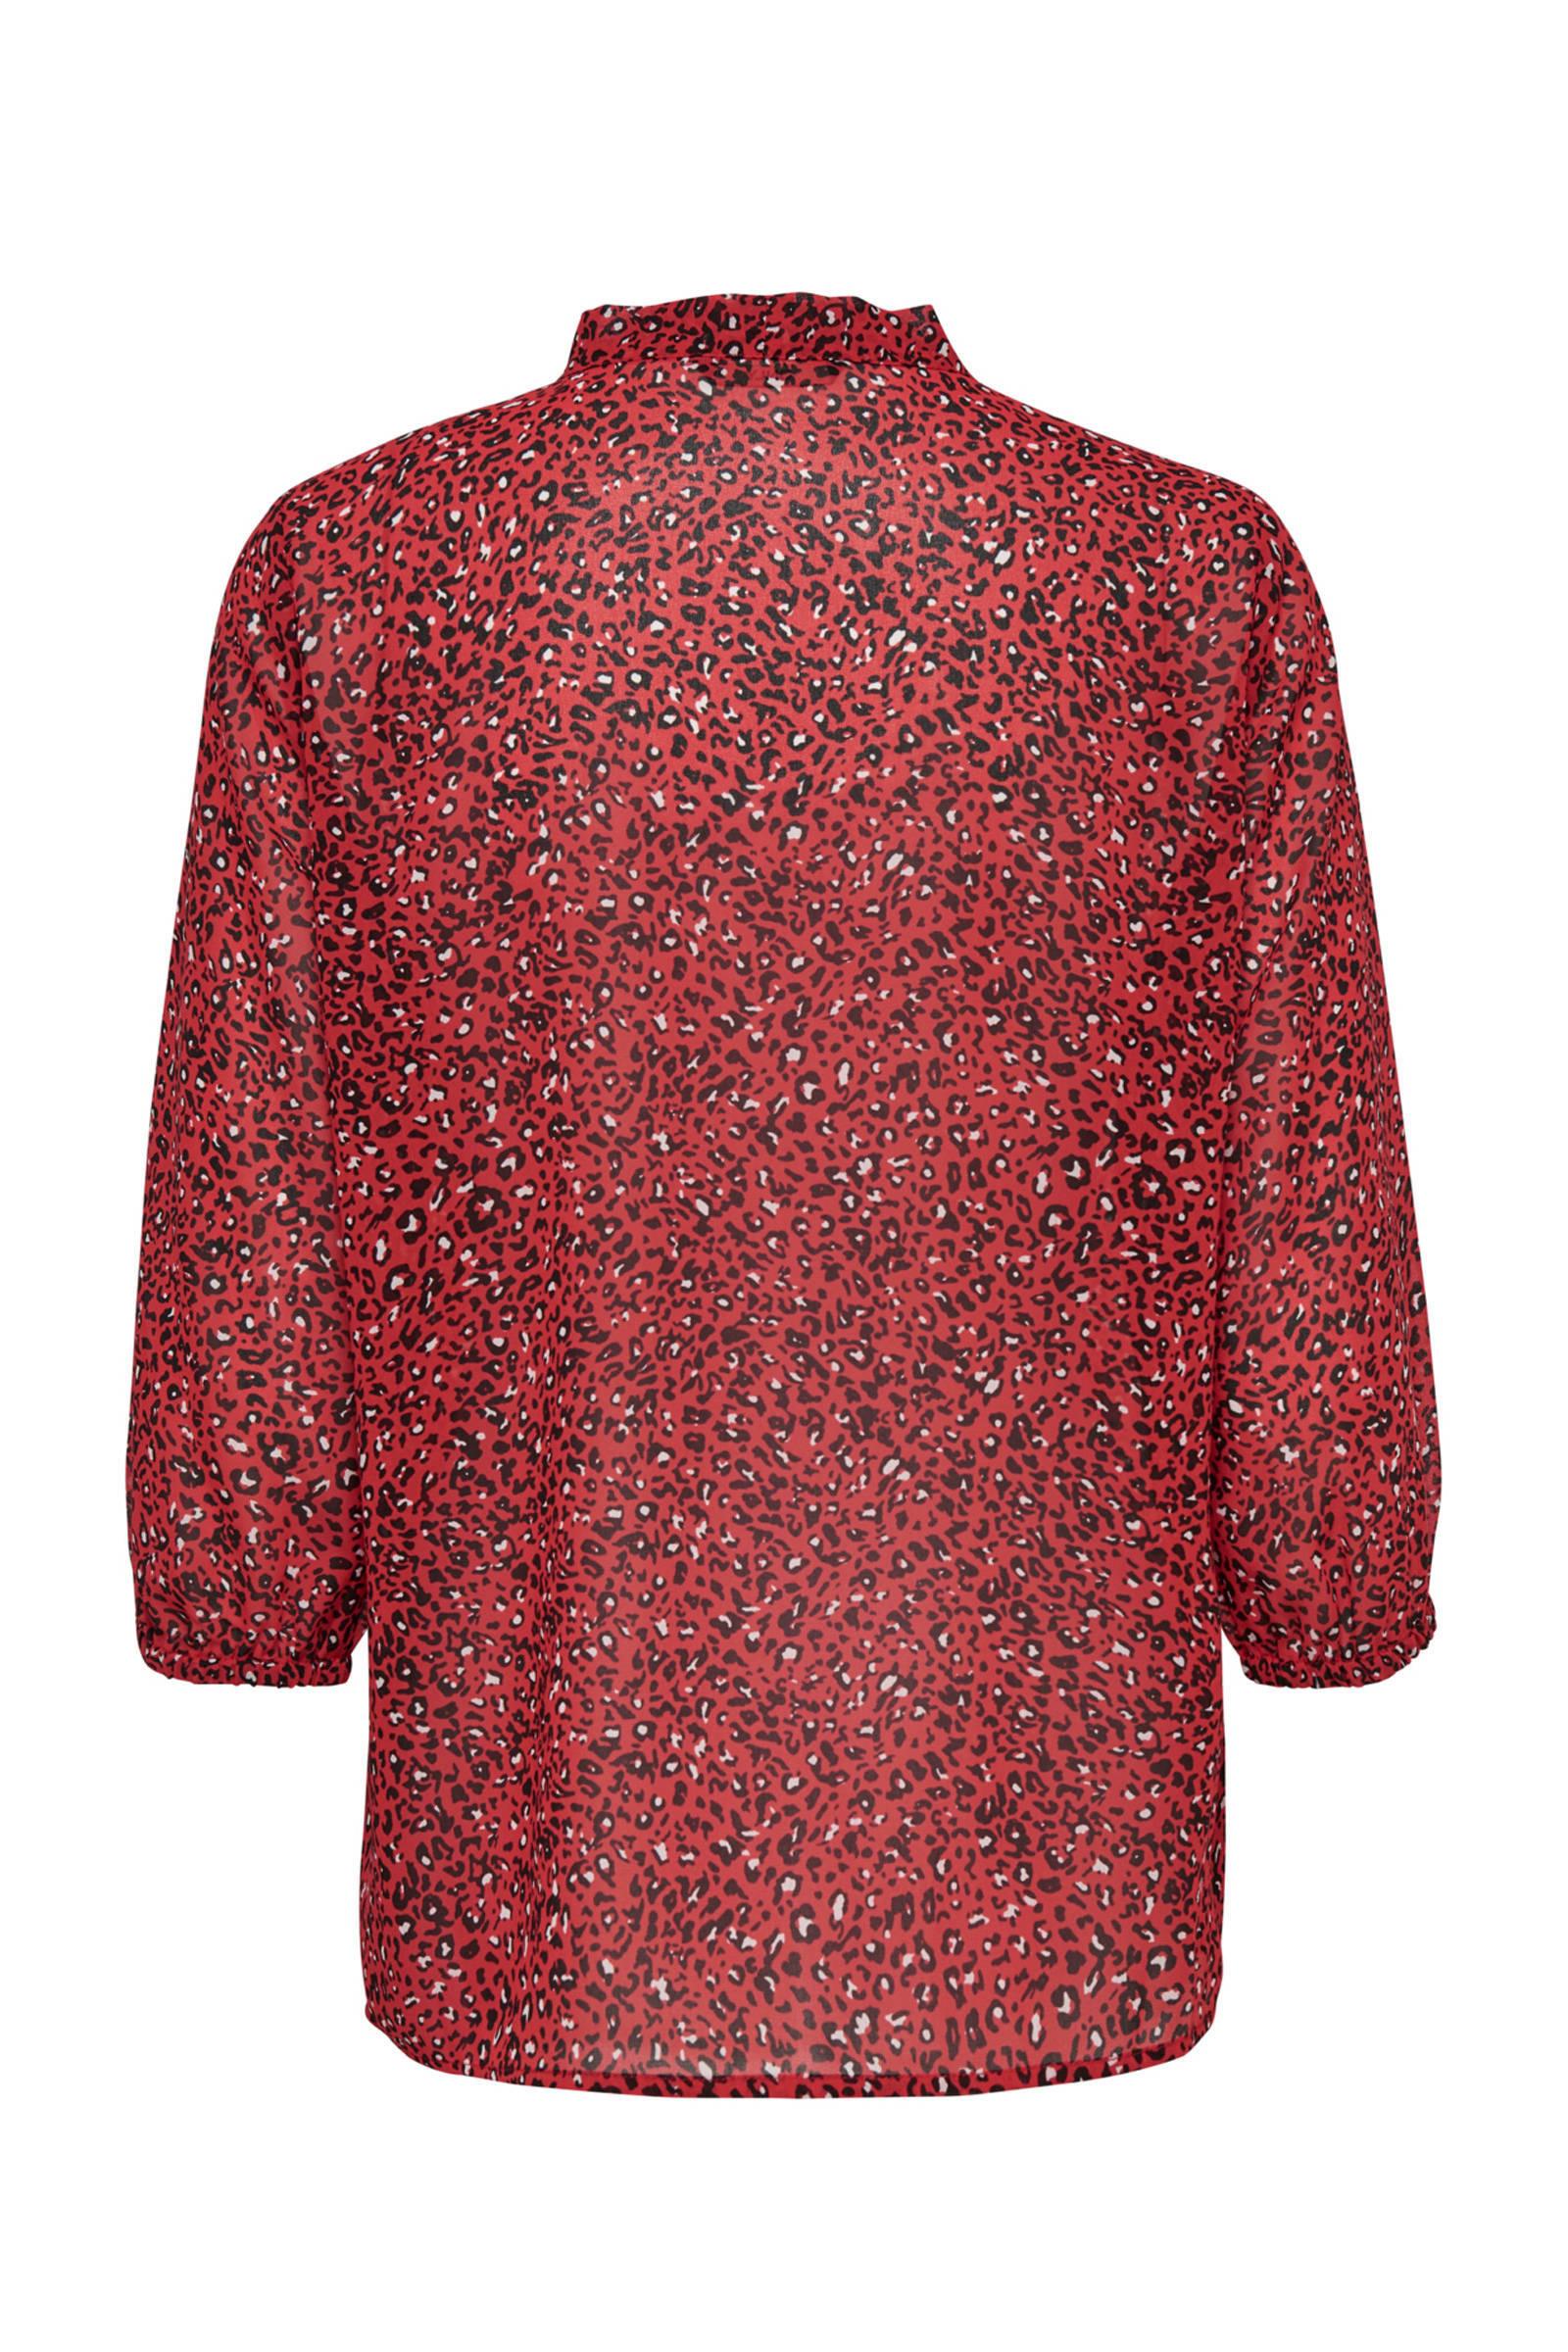 met blouse volant en panterprint ONLY wpq6X0x7A